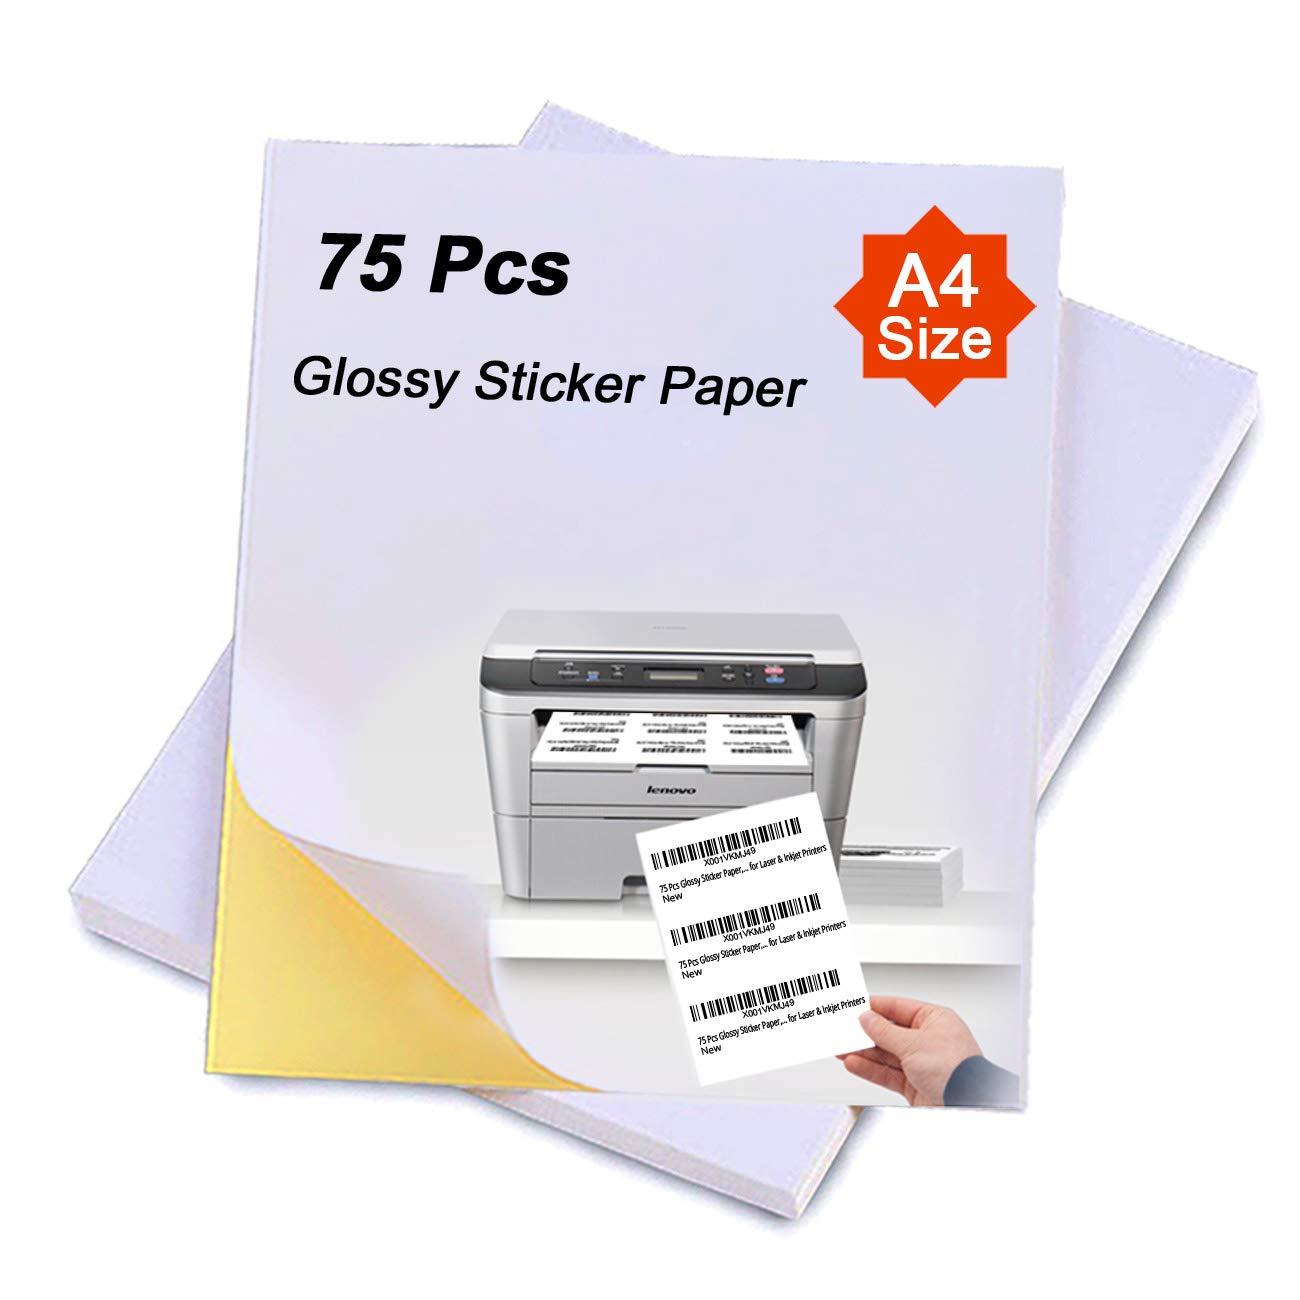 75 Pcs A4 Glossy Sticker Paper, Self Adhesive Sticker Label Paper for  Printer